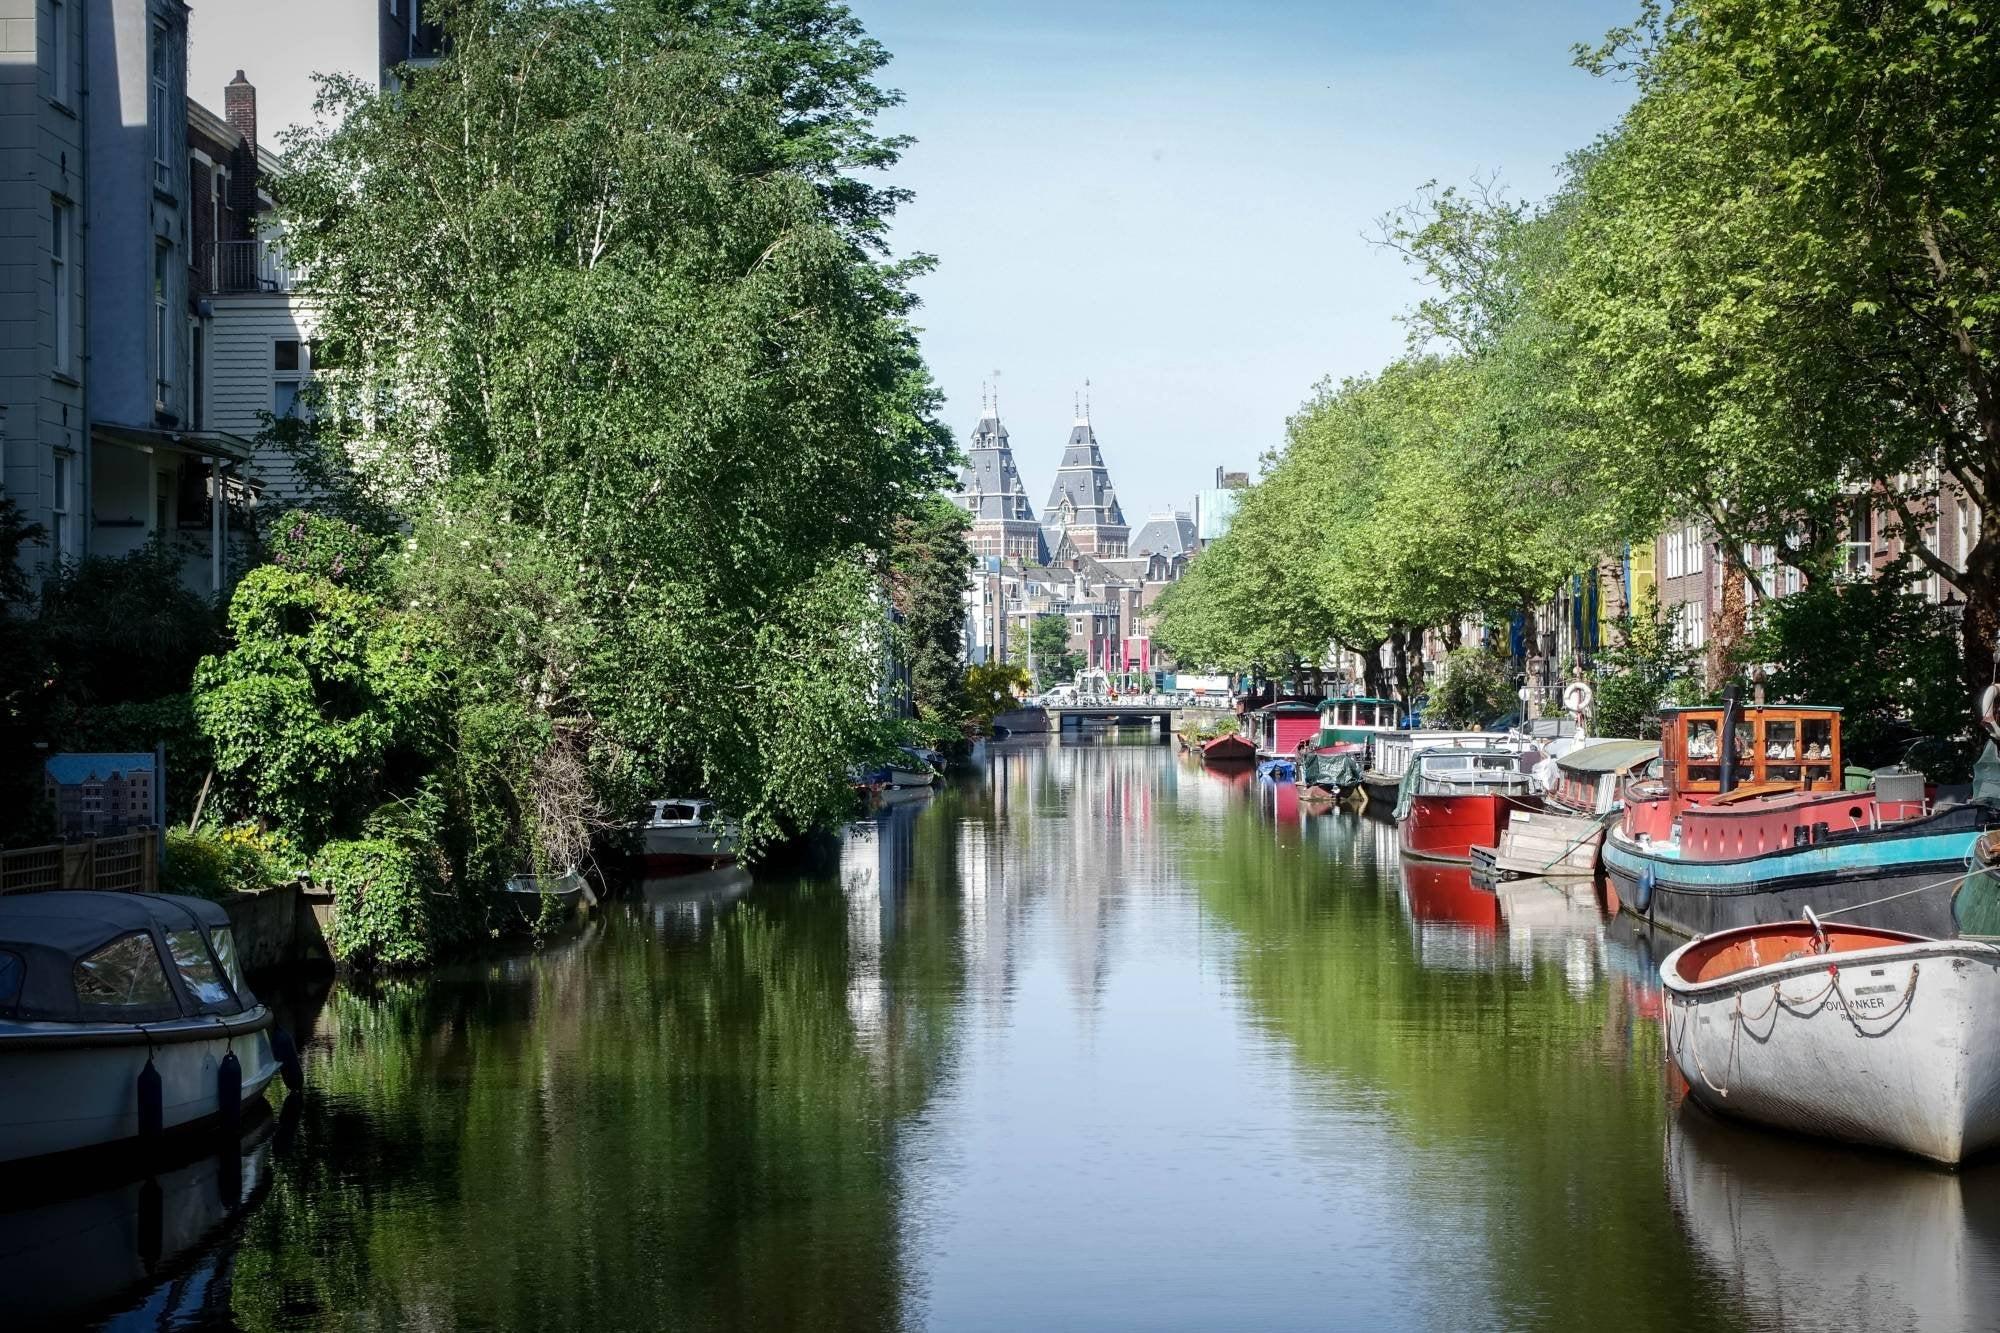 Fokke Simonszstraat, Amsterdam